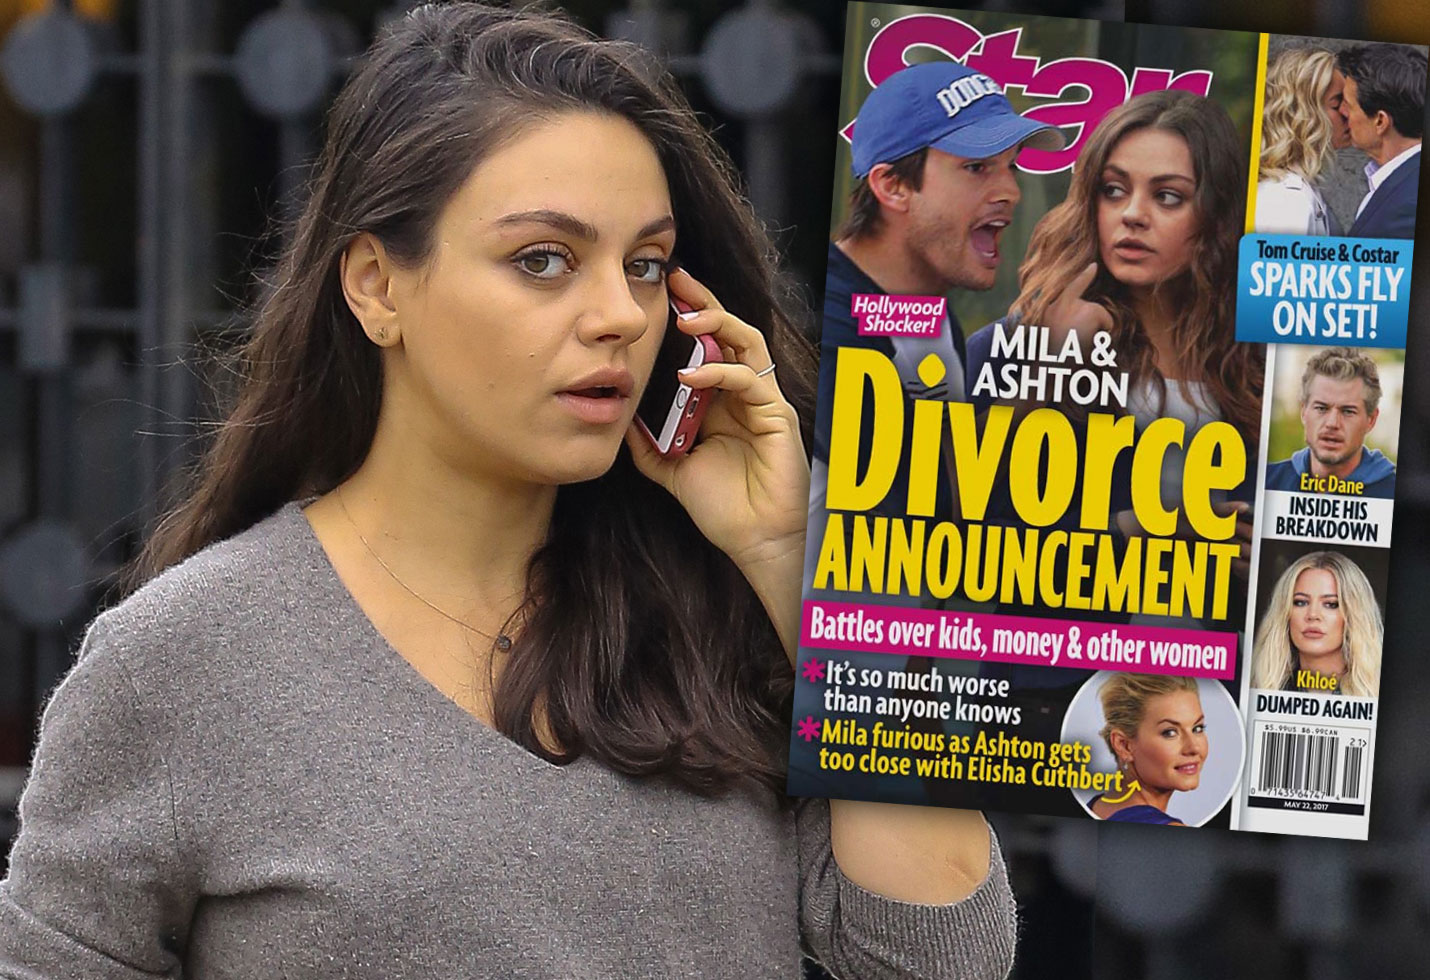 Ashton Kutcher Mila Kunis Marriage Trouble Secrets